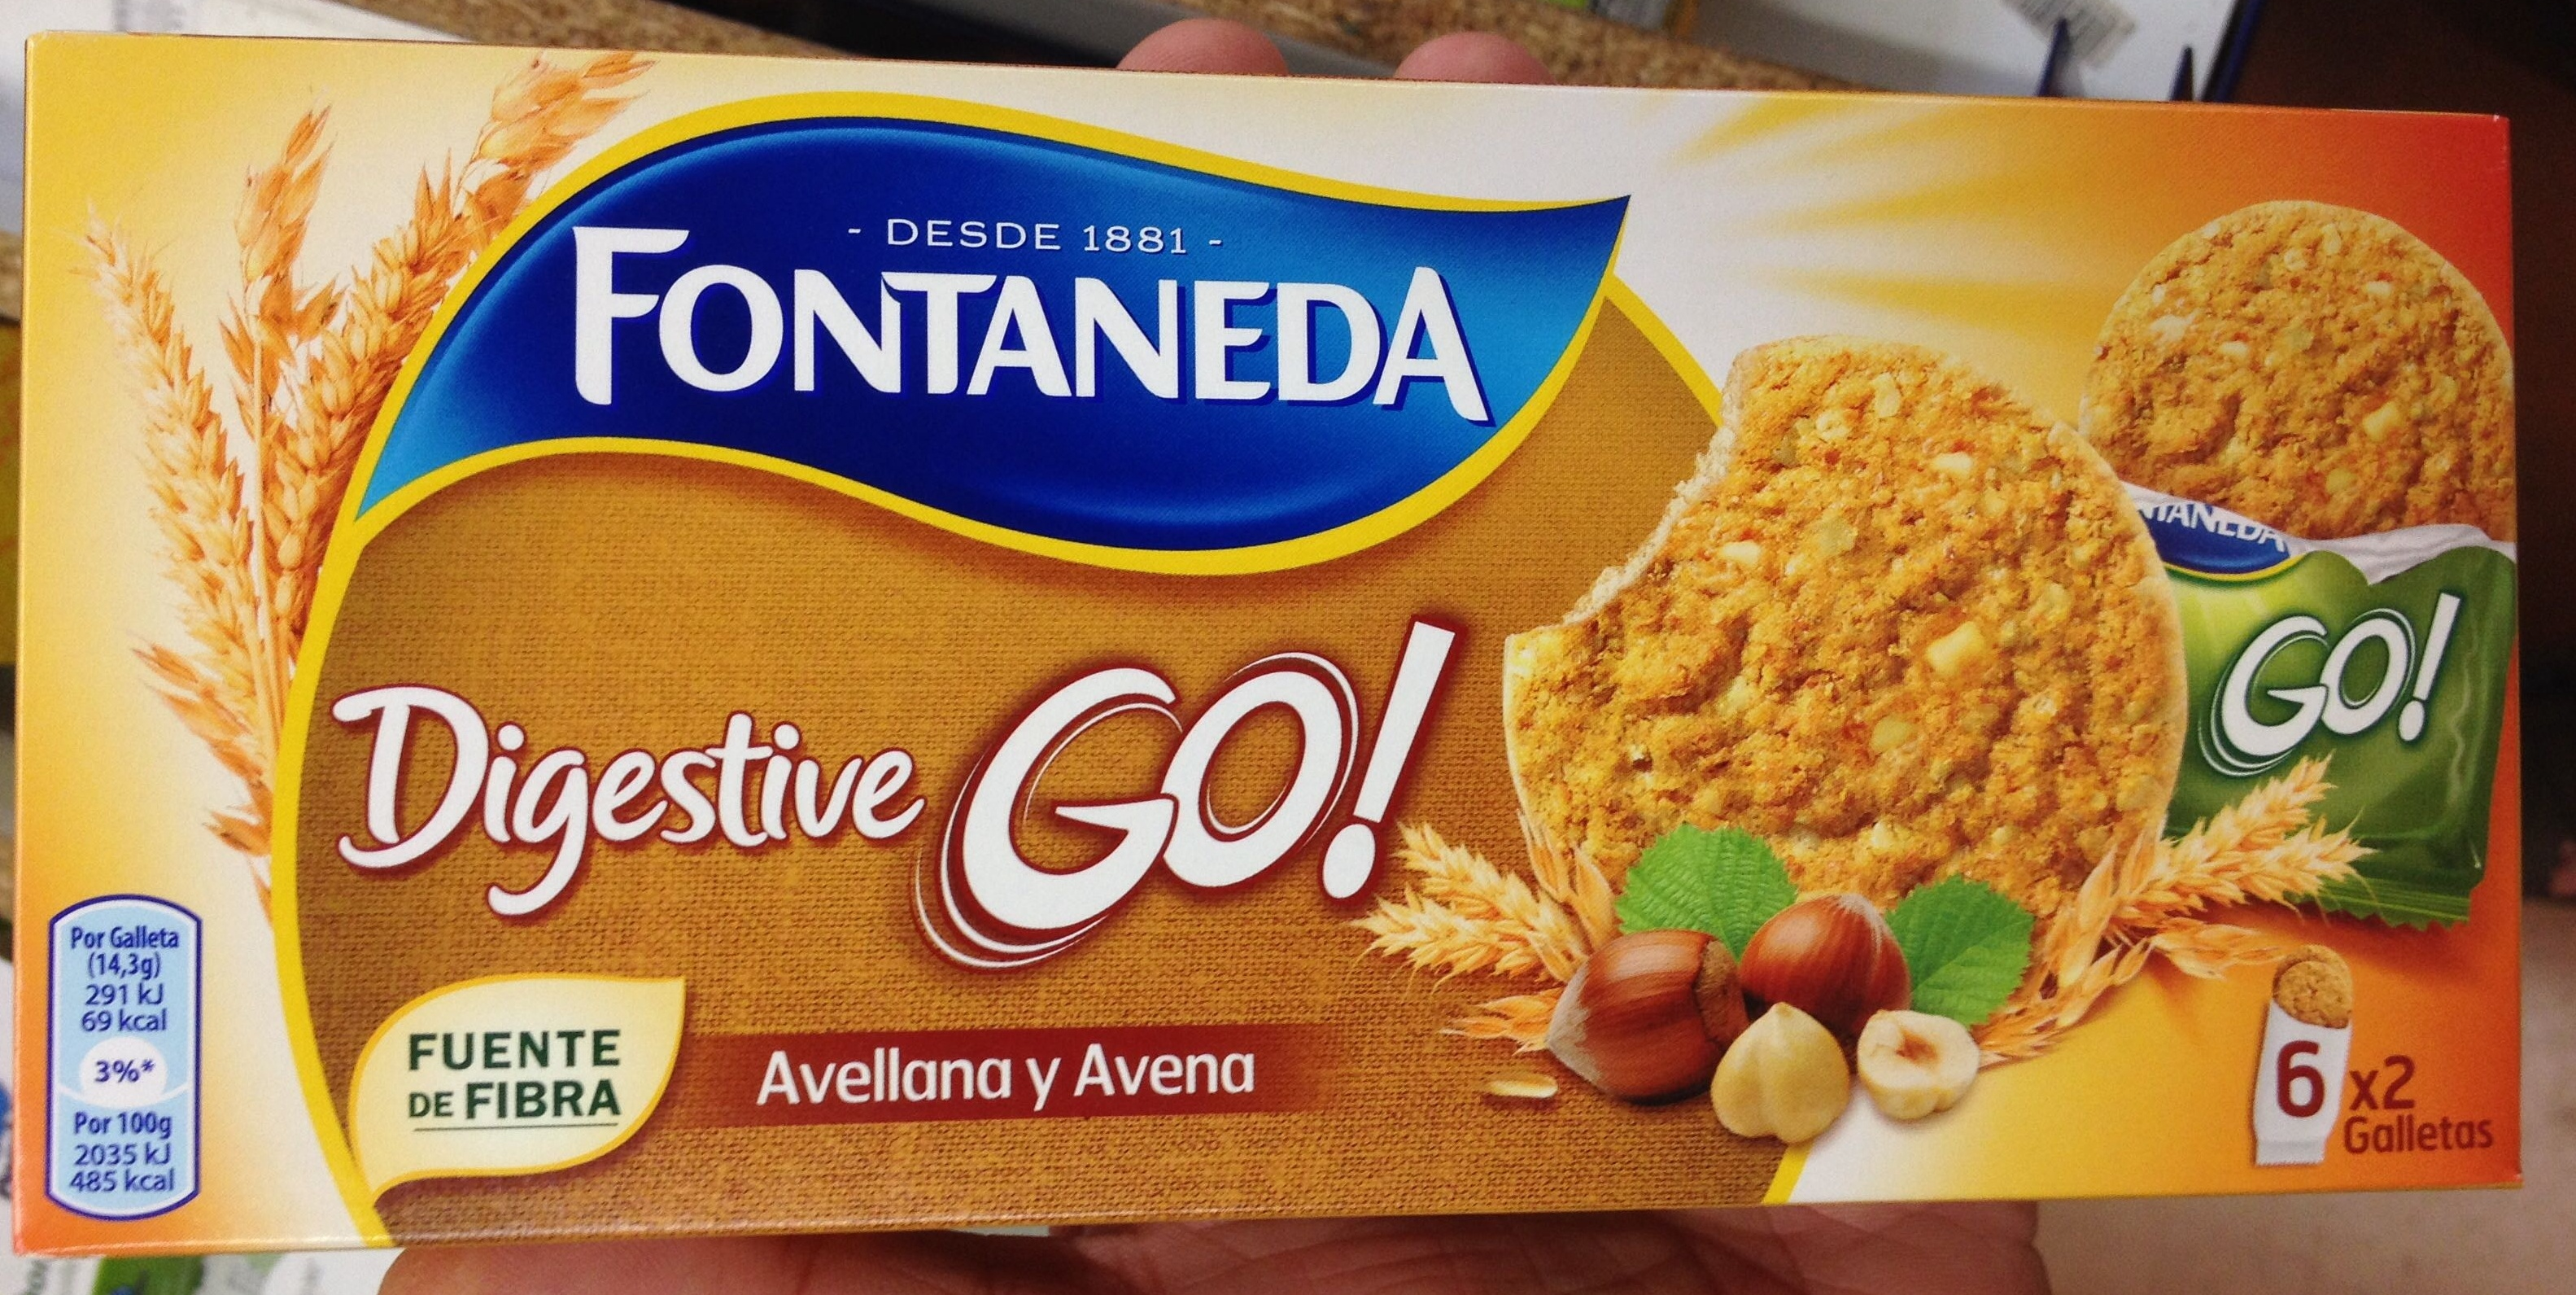 Digestive Go! - Product - fr